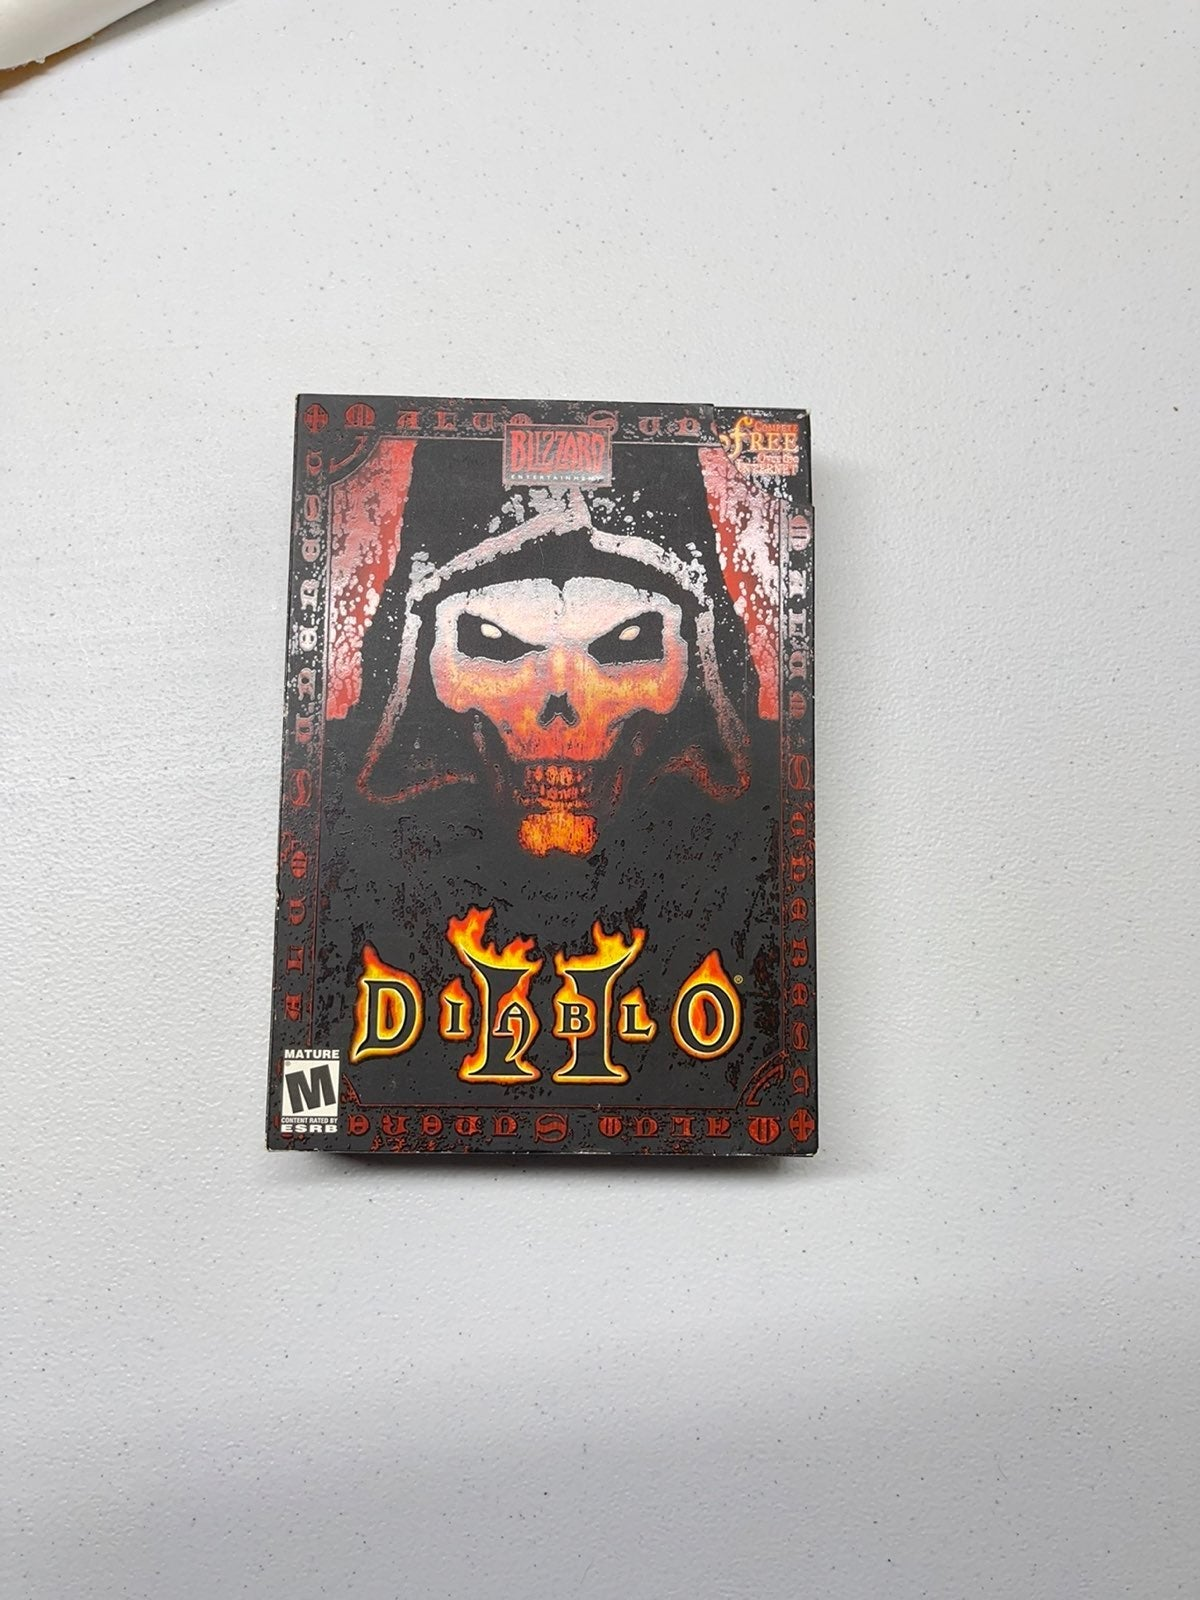 Diablo II pc game complete